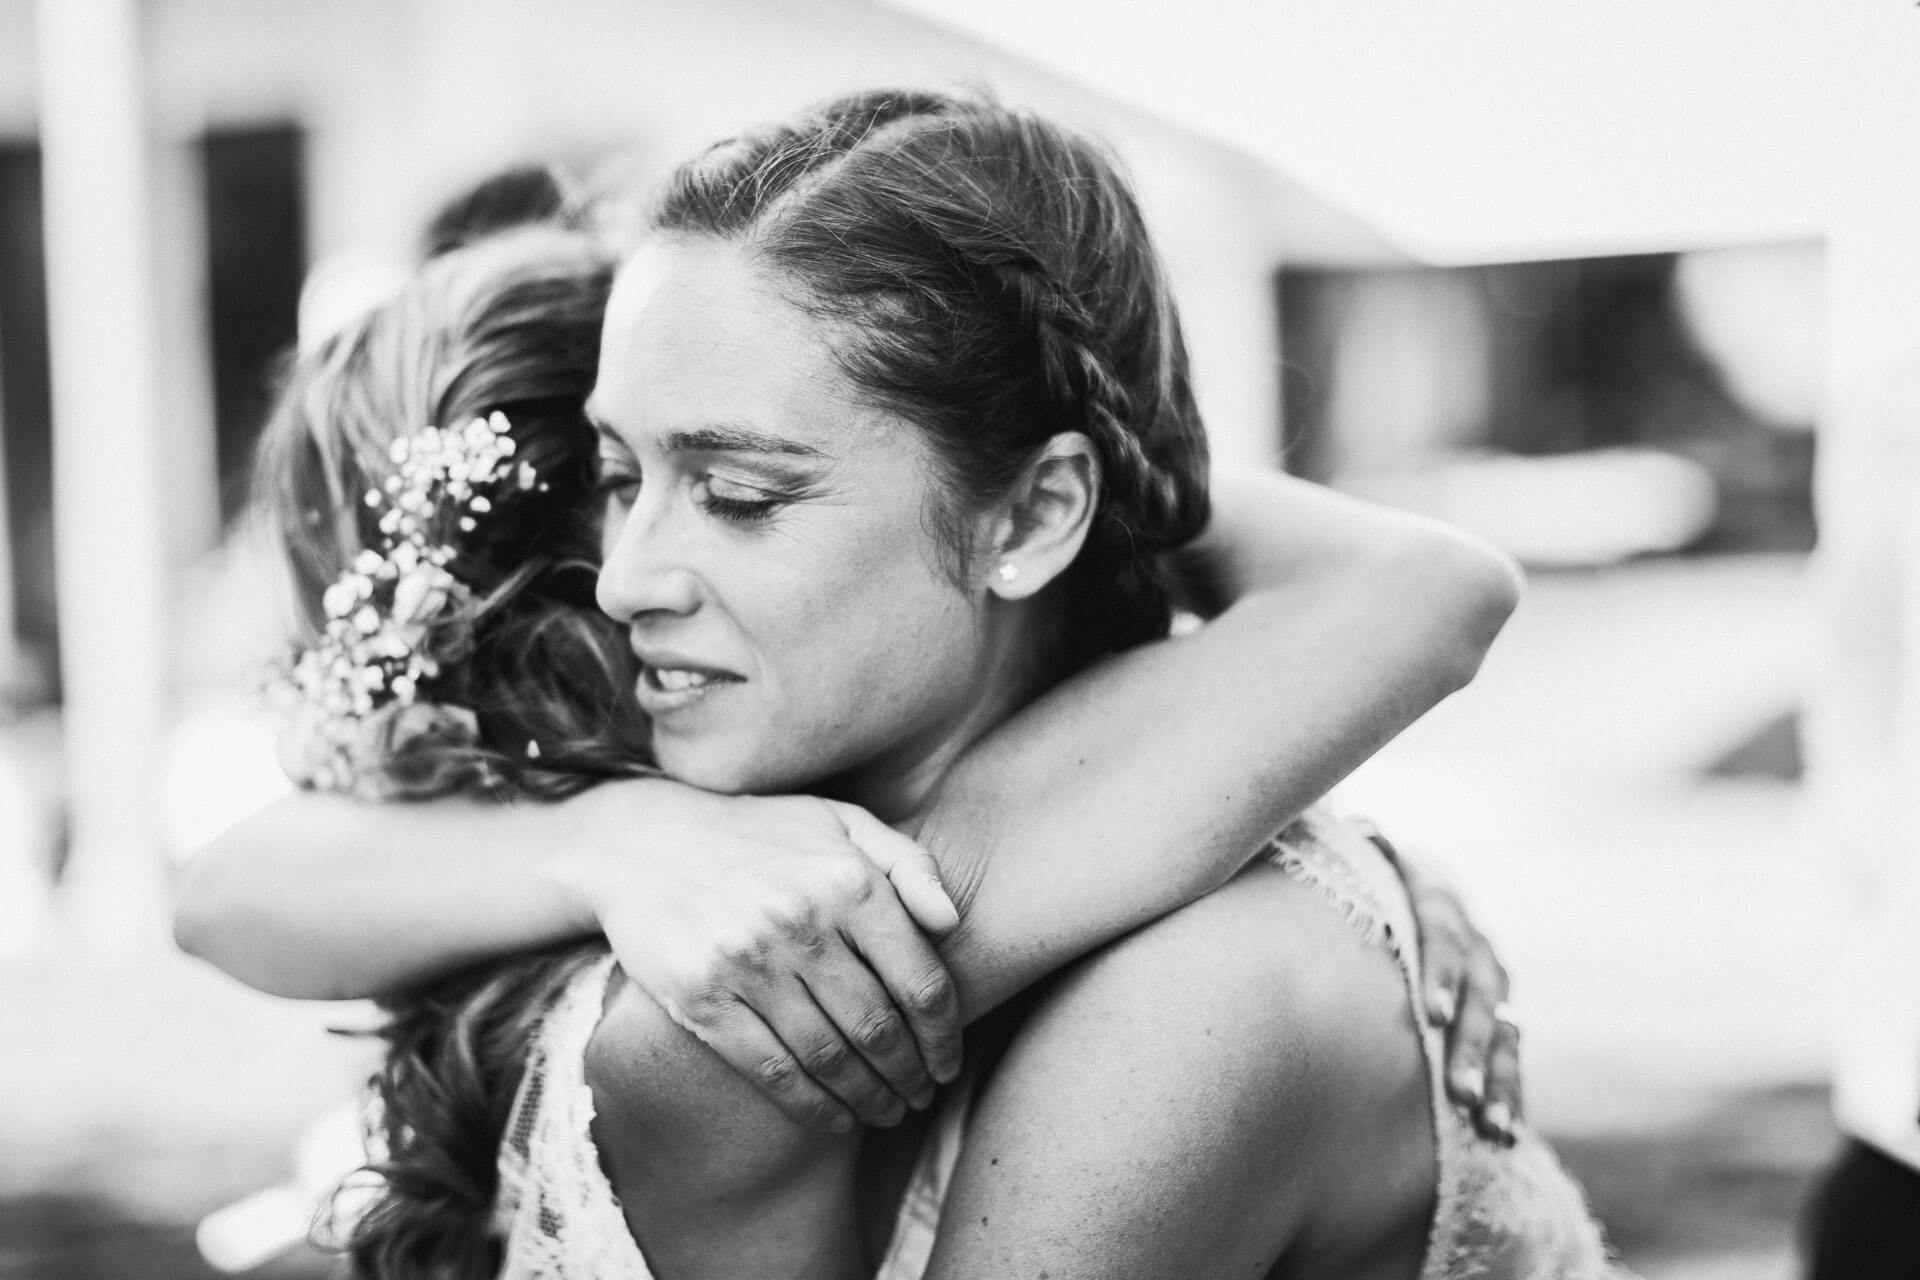 photographe-mariage-aix-en-provence-stephanie-jerome-18